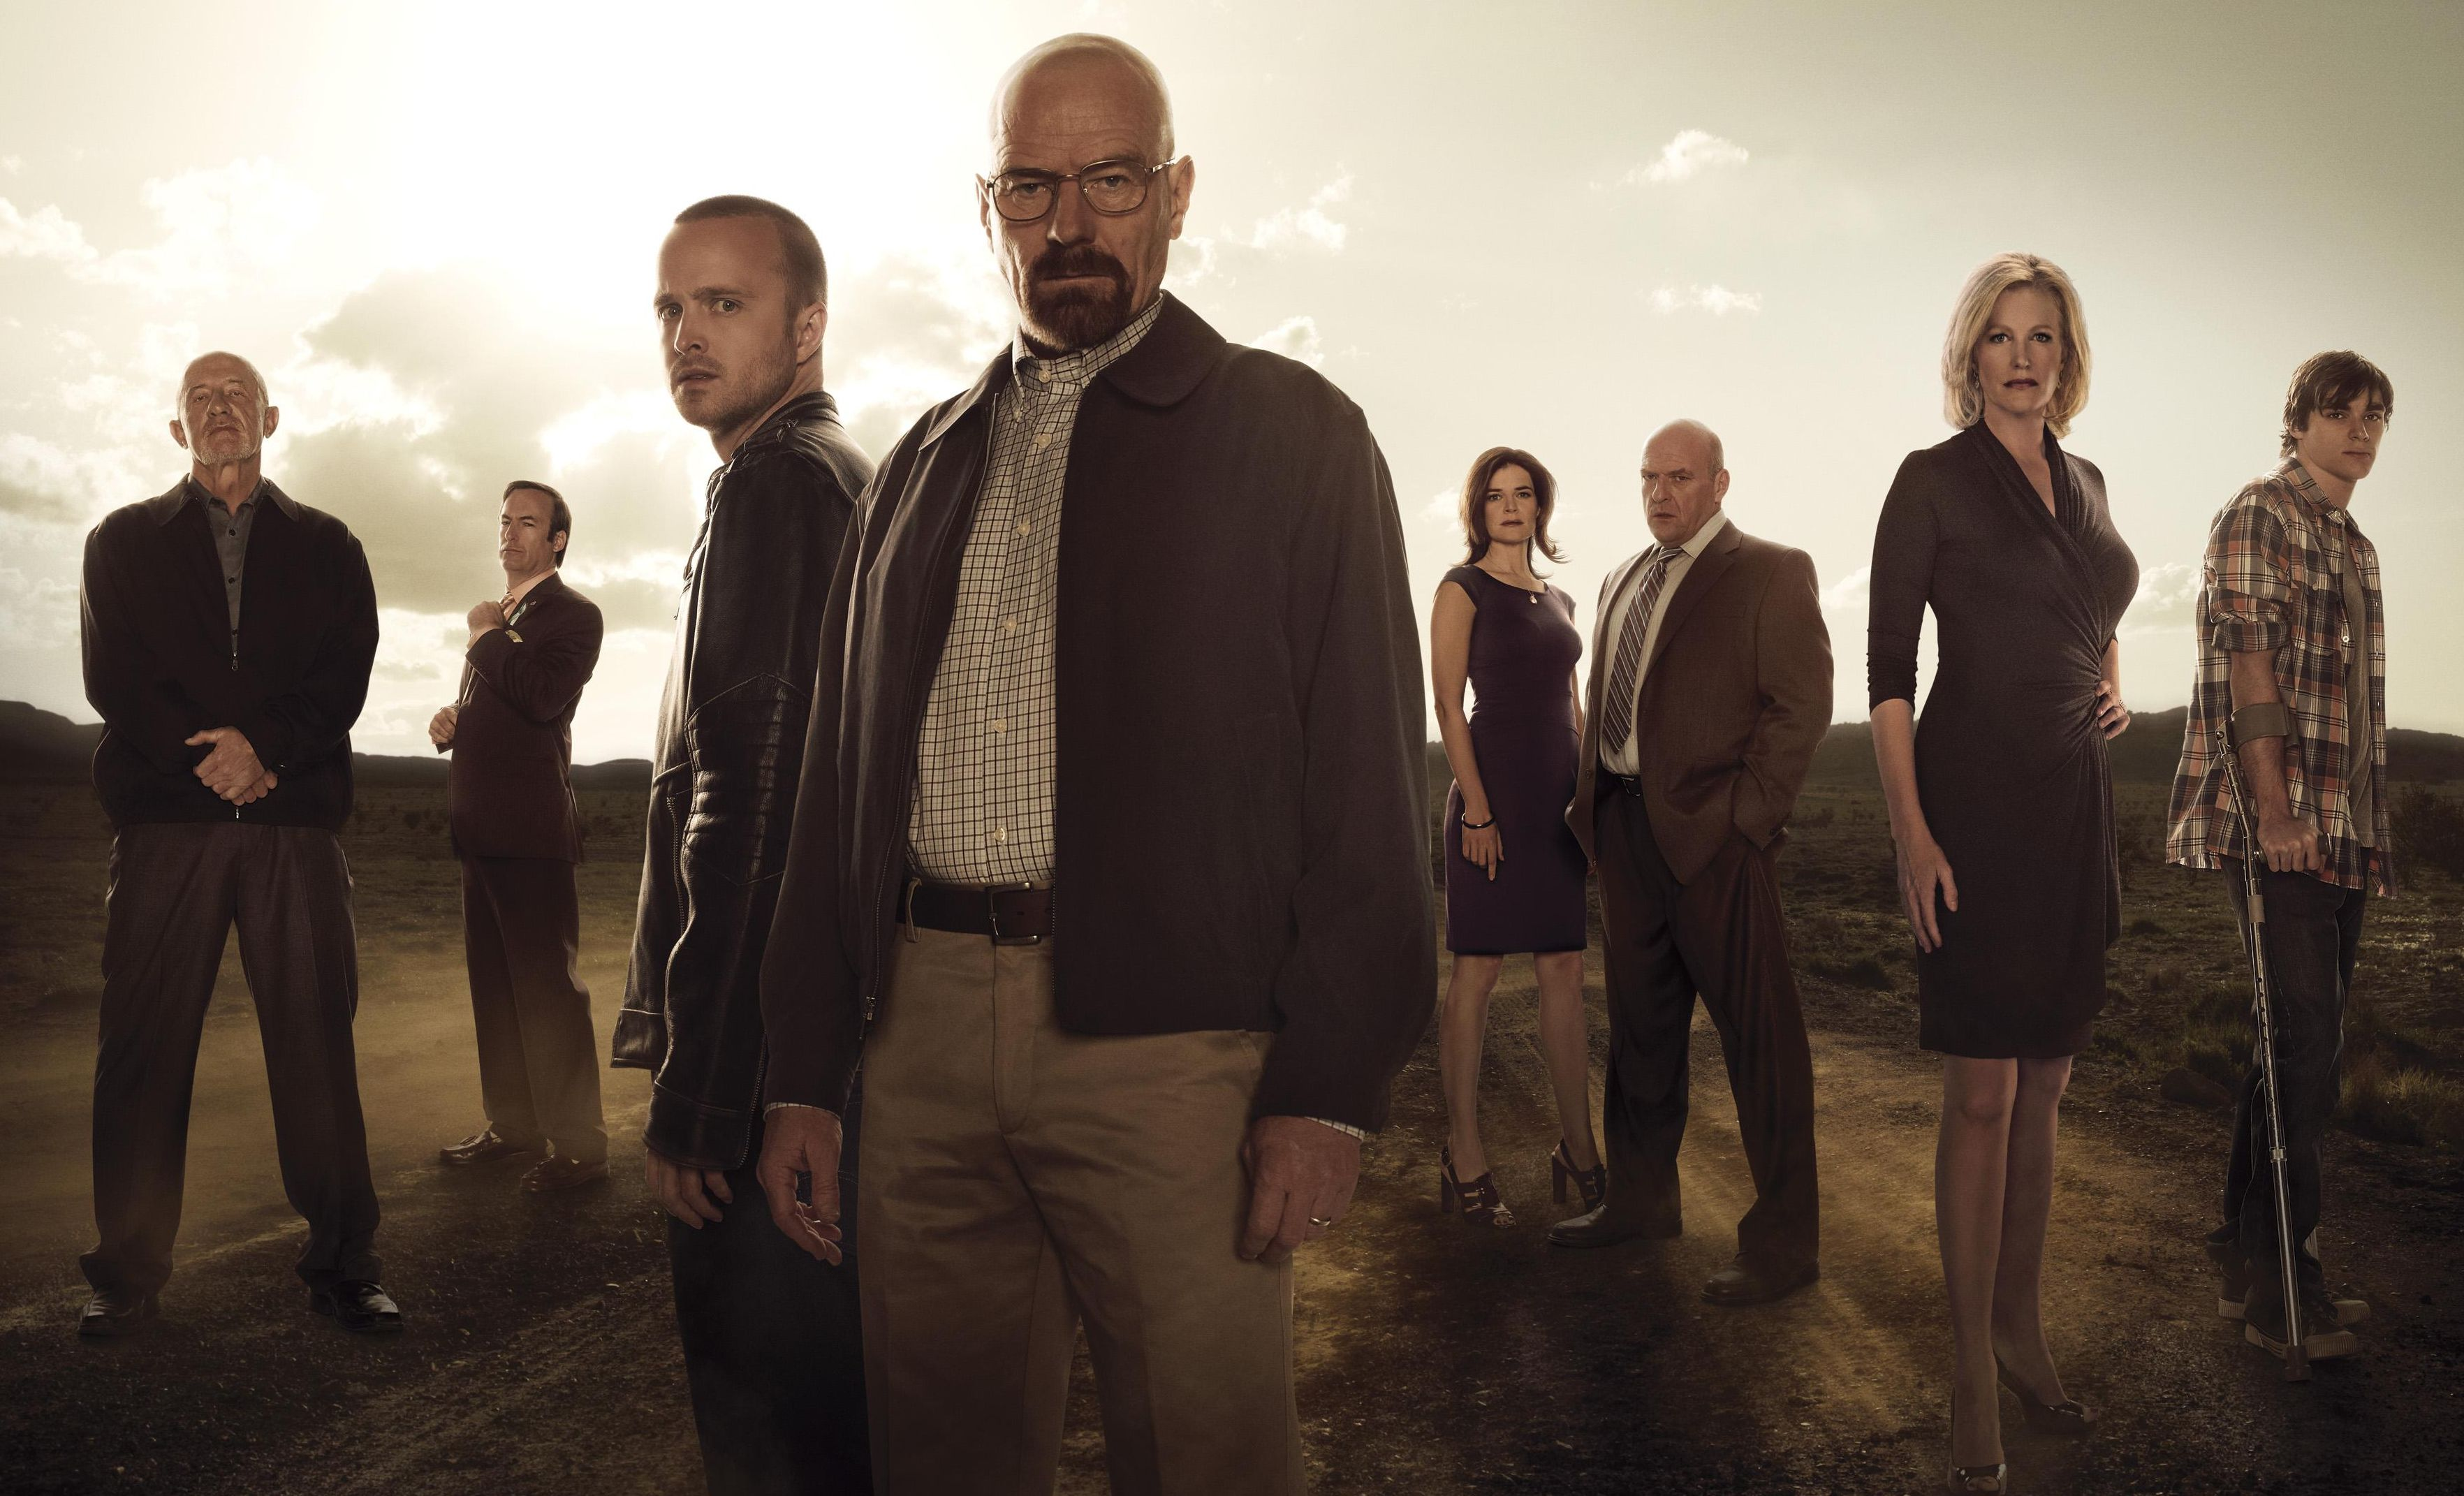 Breaking Bad cast overview